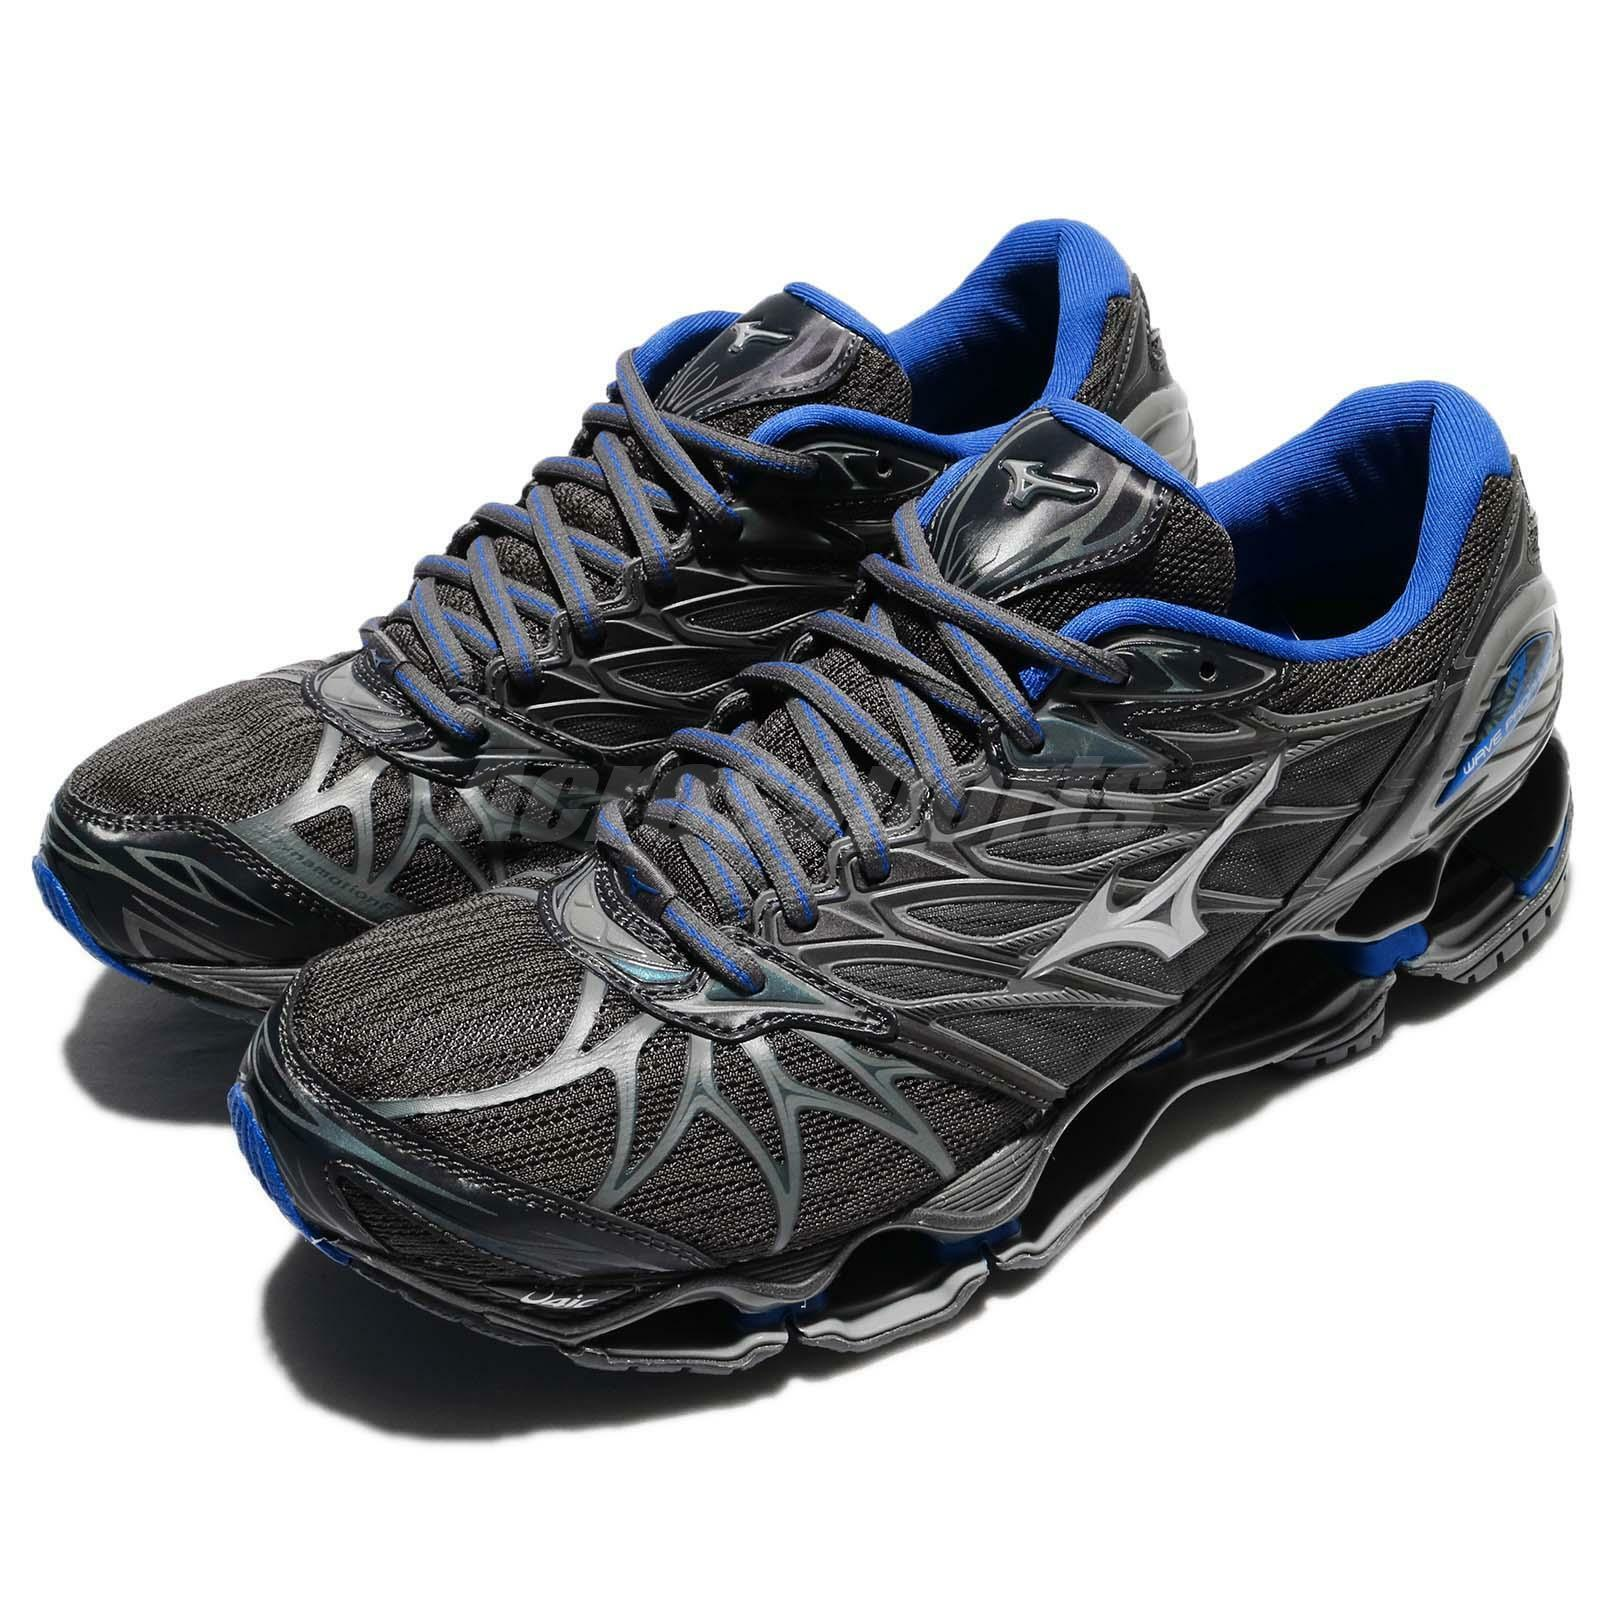 Mizuno Wave Prophecy 7 Nova VII Grey bluee Men Running shoes Trainers J1GC1817-03